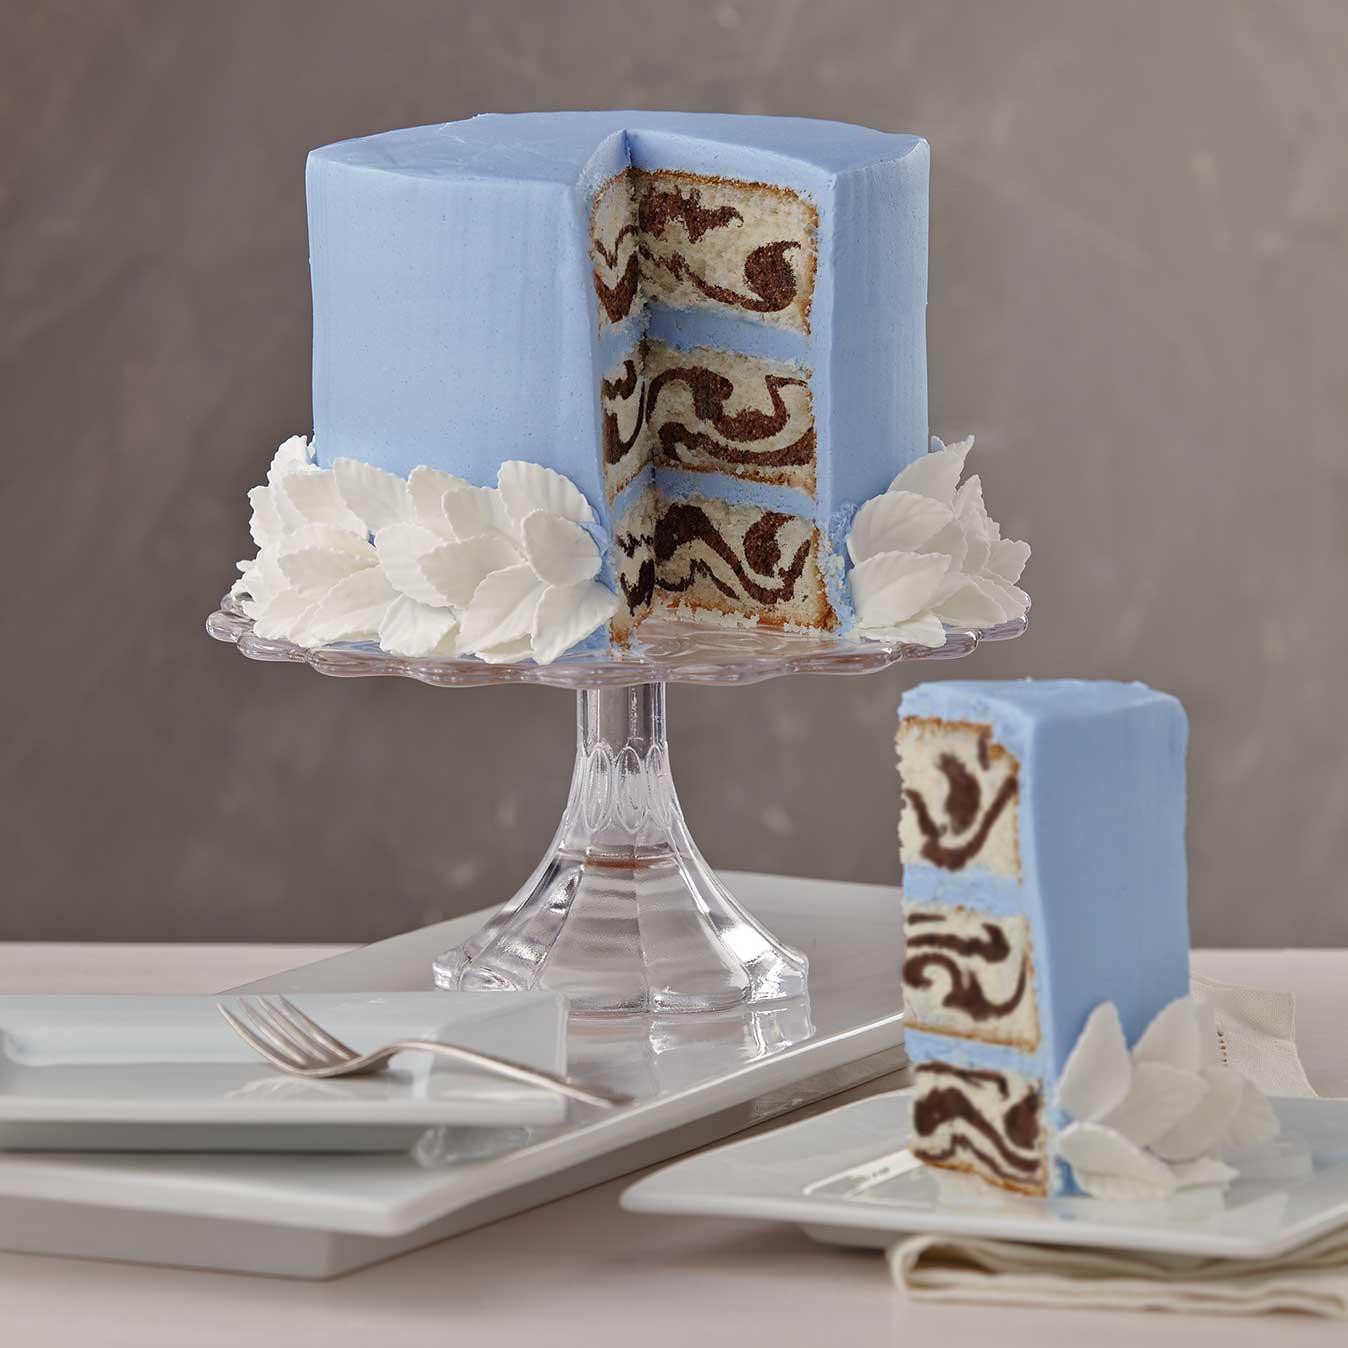 Professional Pastry And Cake Design School Pescara : Wilton Cake Courses White River